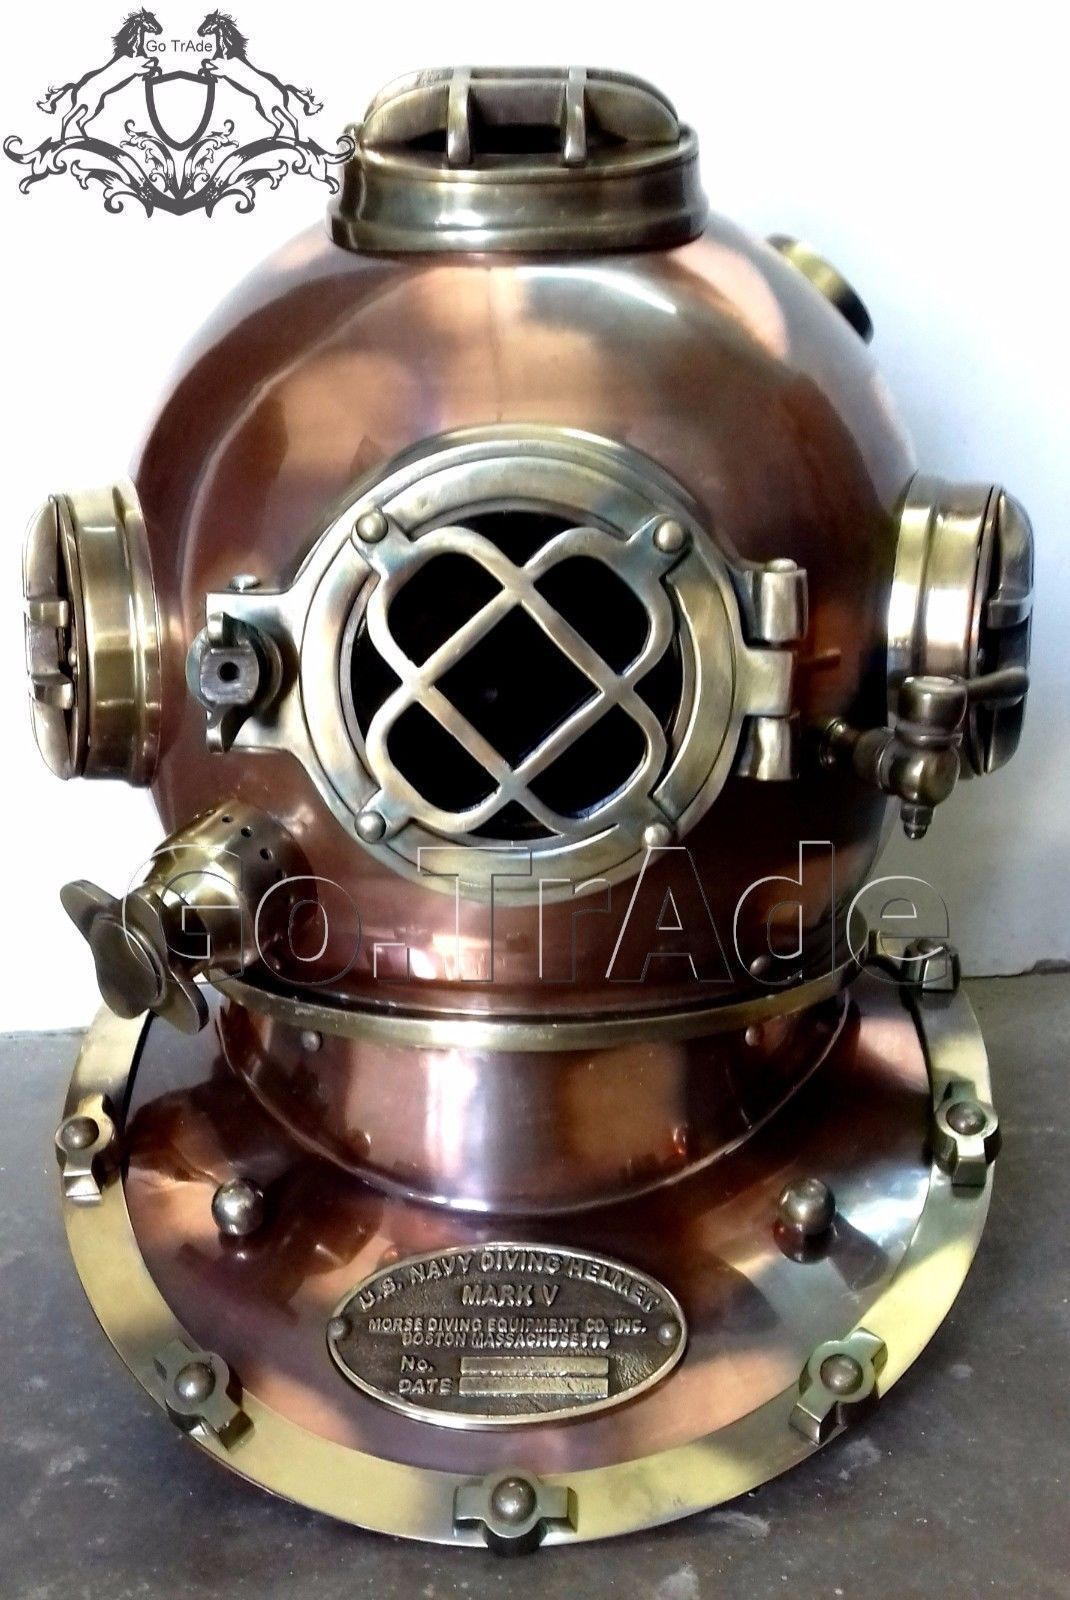 Vintage Diving Helmet Antique Scuba U.S Navy Mark V Scuba Divers Helmet Gift